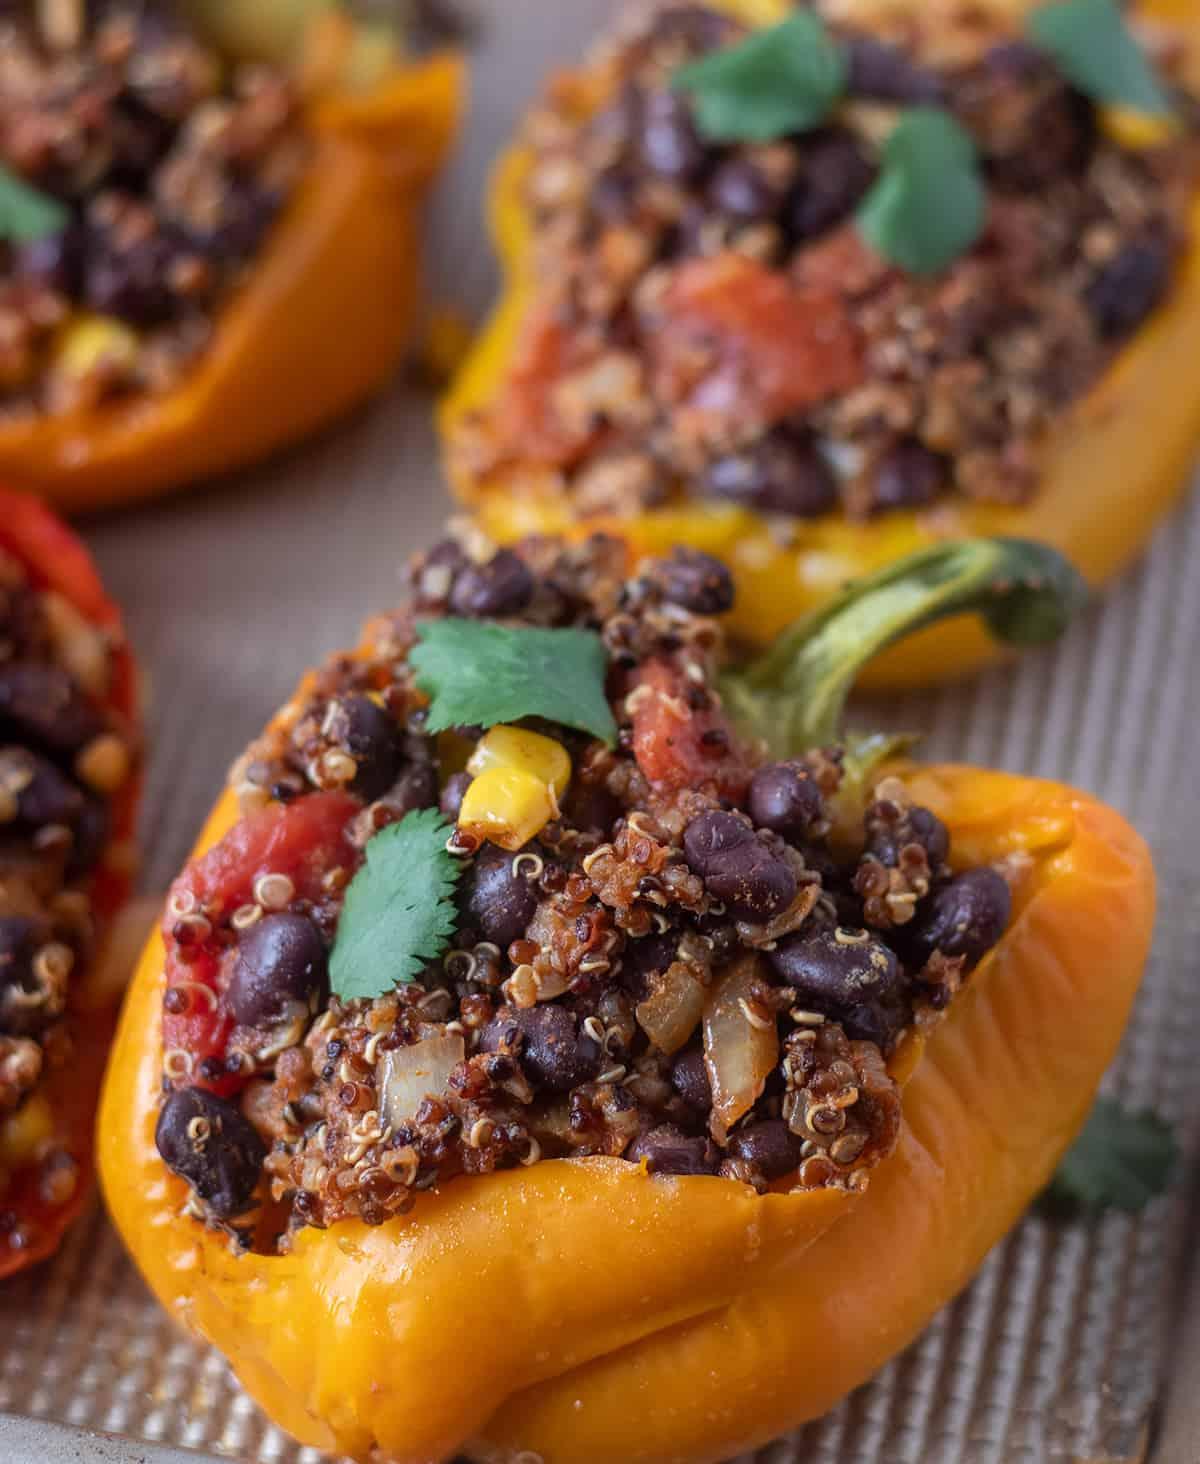 Vegan stuffed peppers with black bean quinoa filling